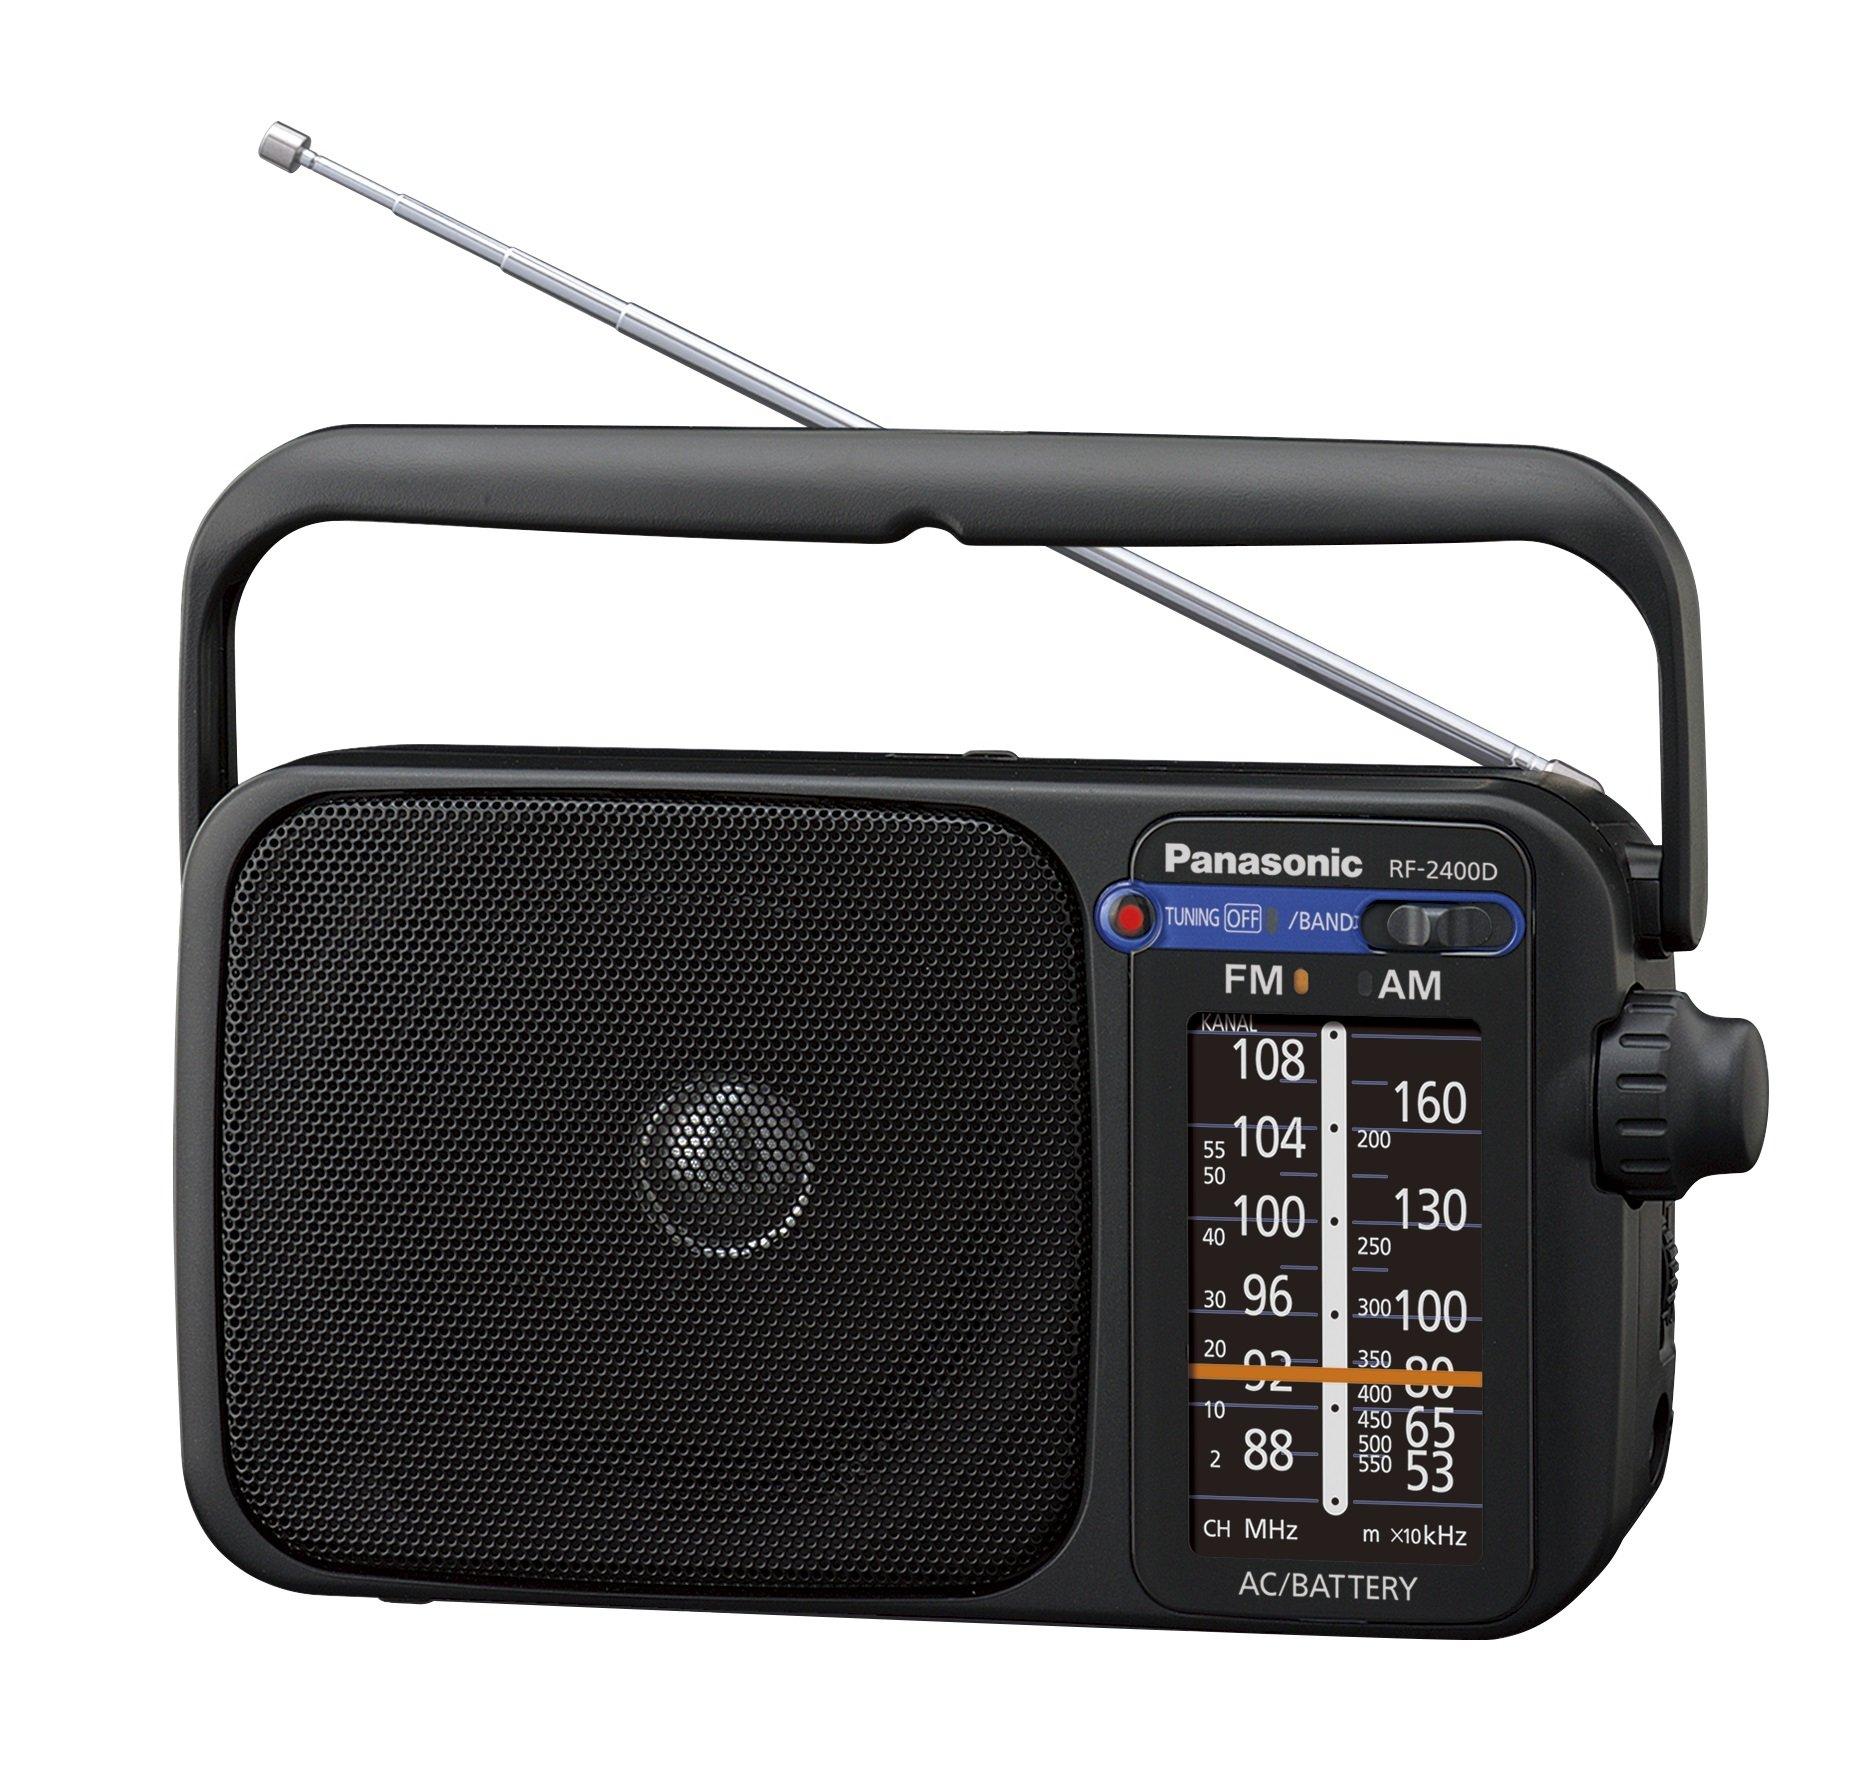 radio РадиоНаходка Russie, Nahodka